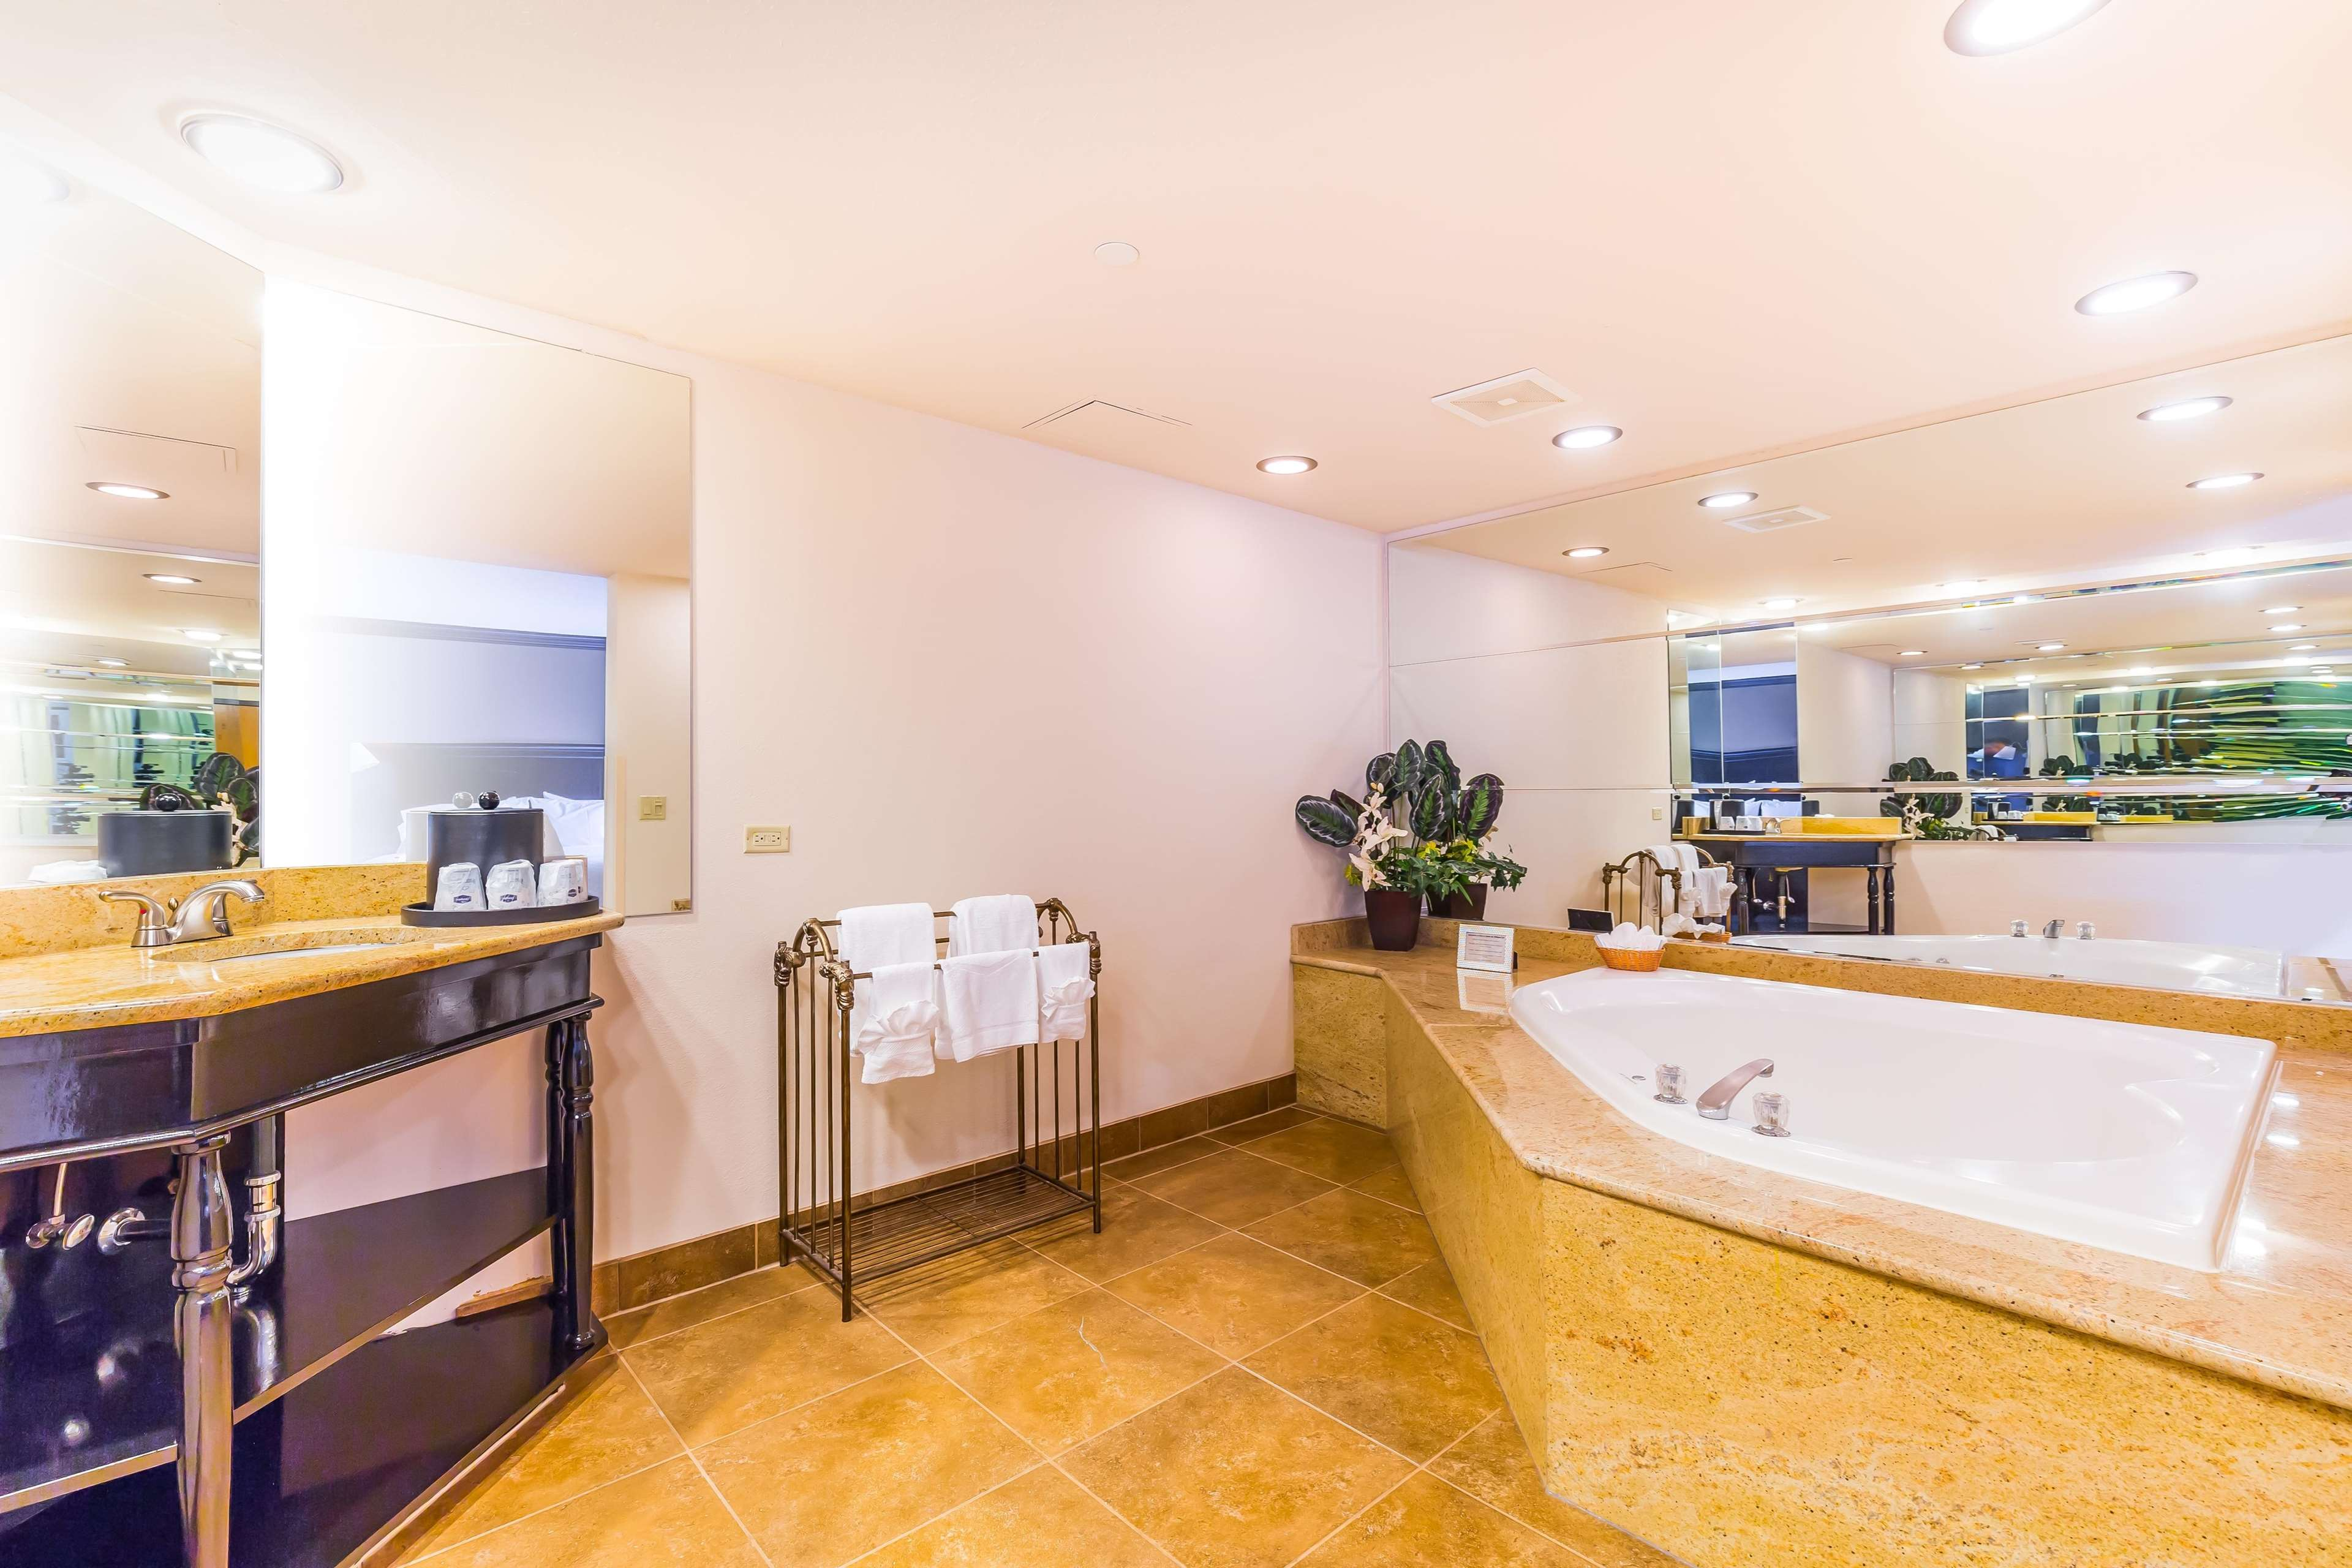 Hampton Inn & Suites Chicago/Hoffman Estates image 29